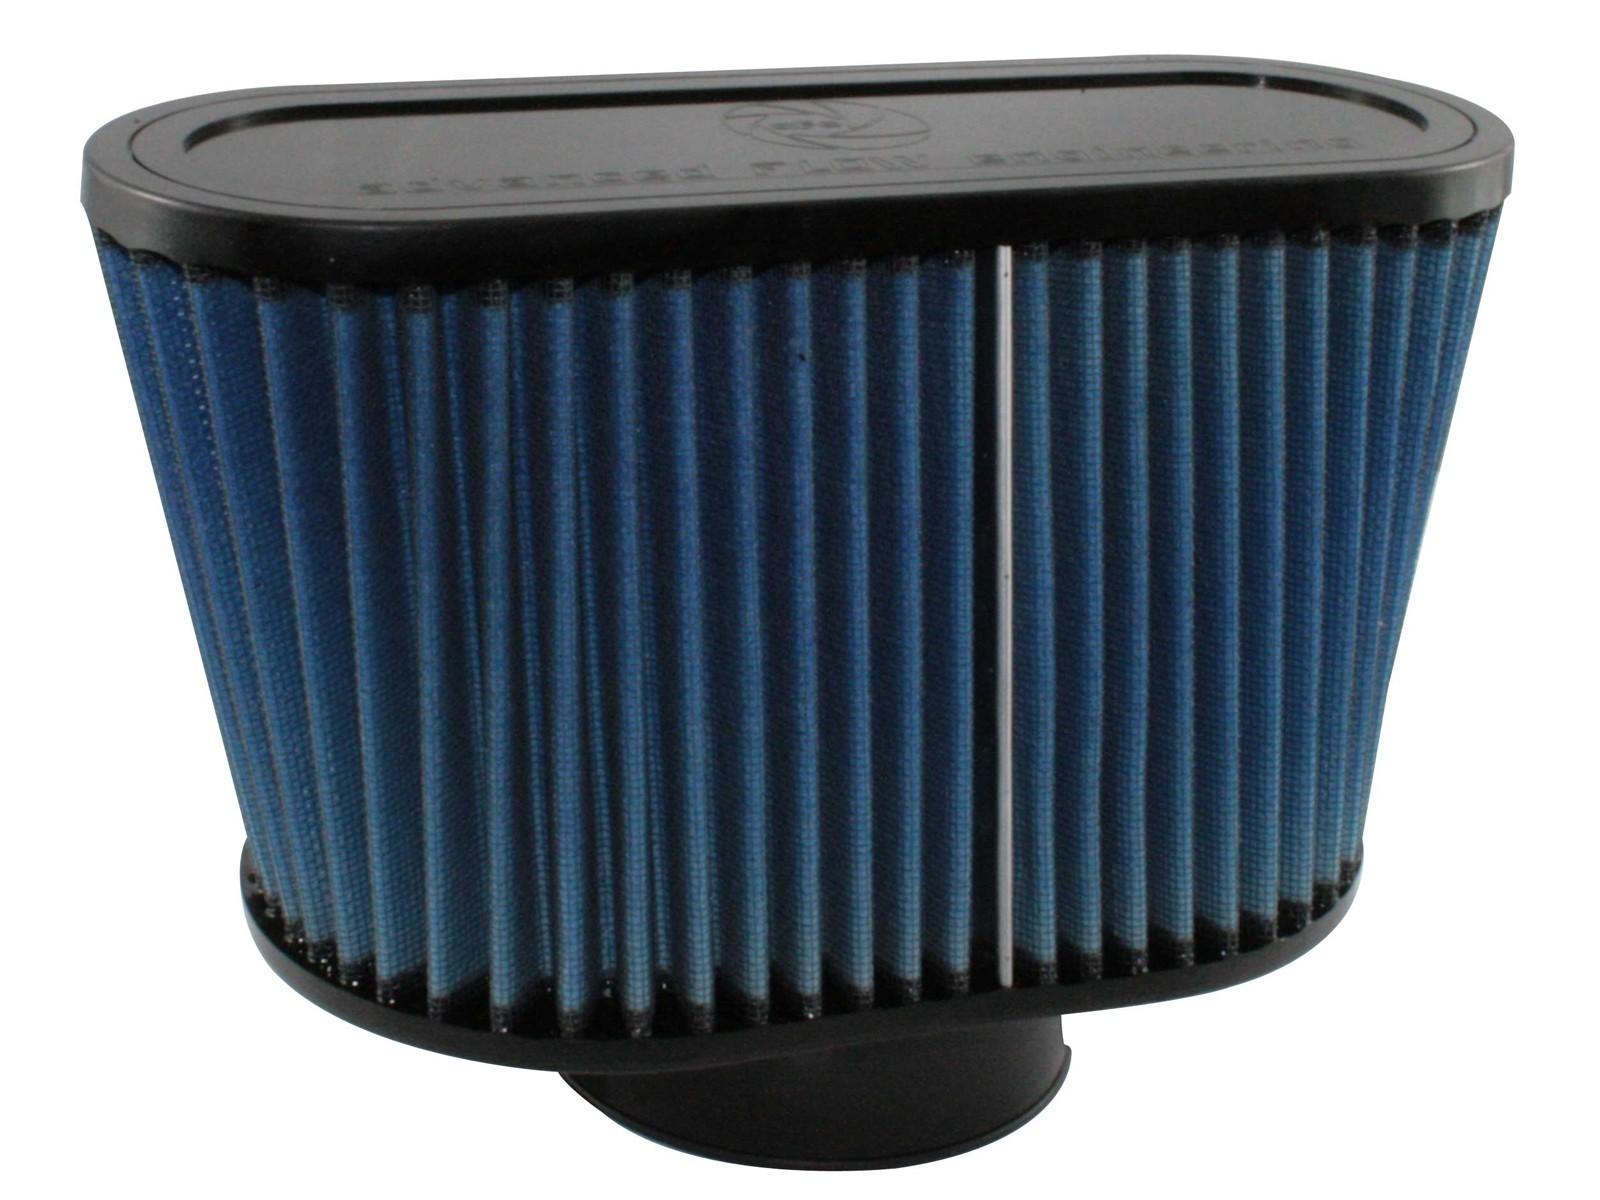 aFe POWER 24-90024 Magnum FLOW Pro 5R Air Filter